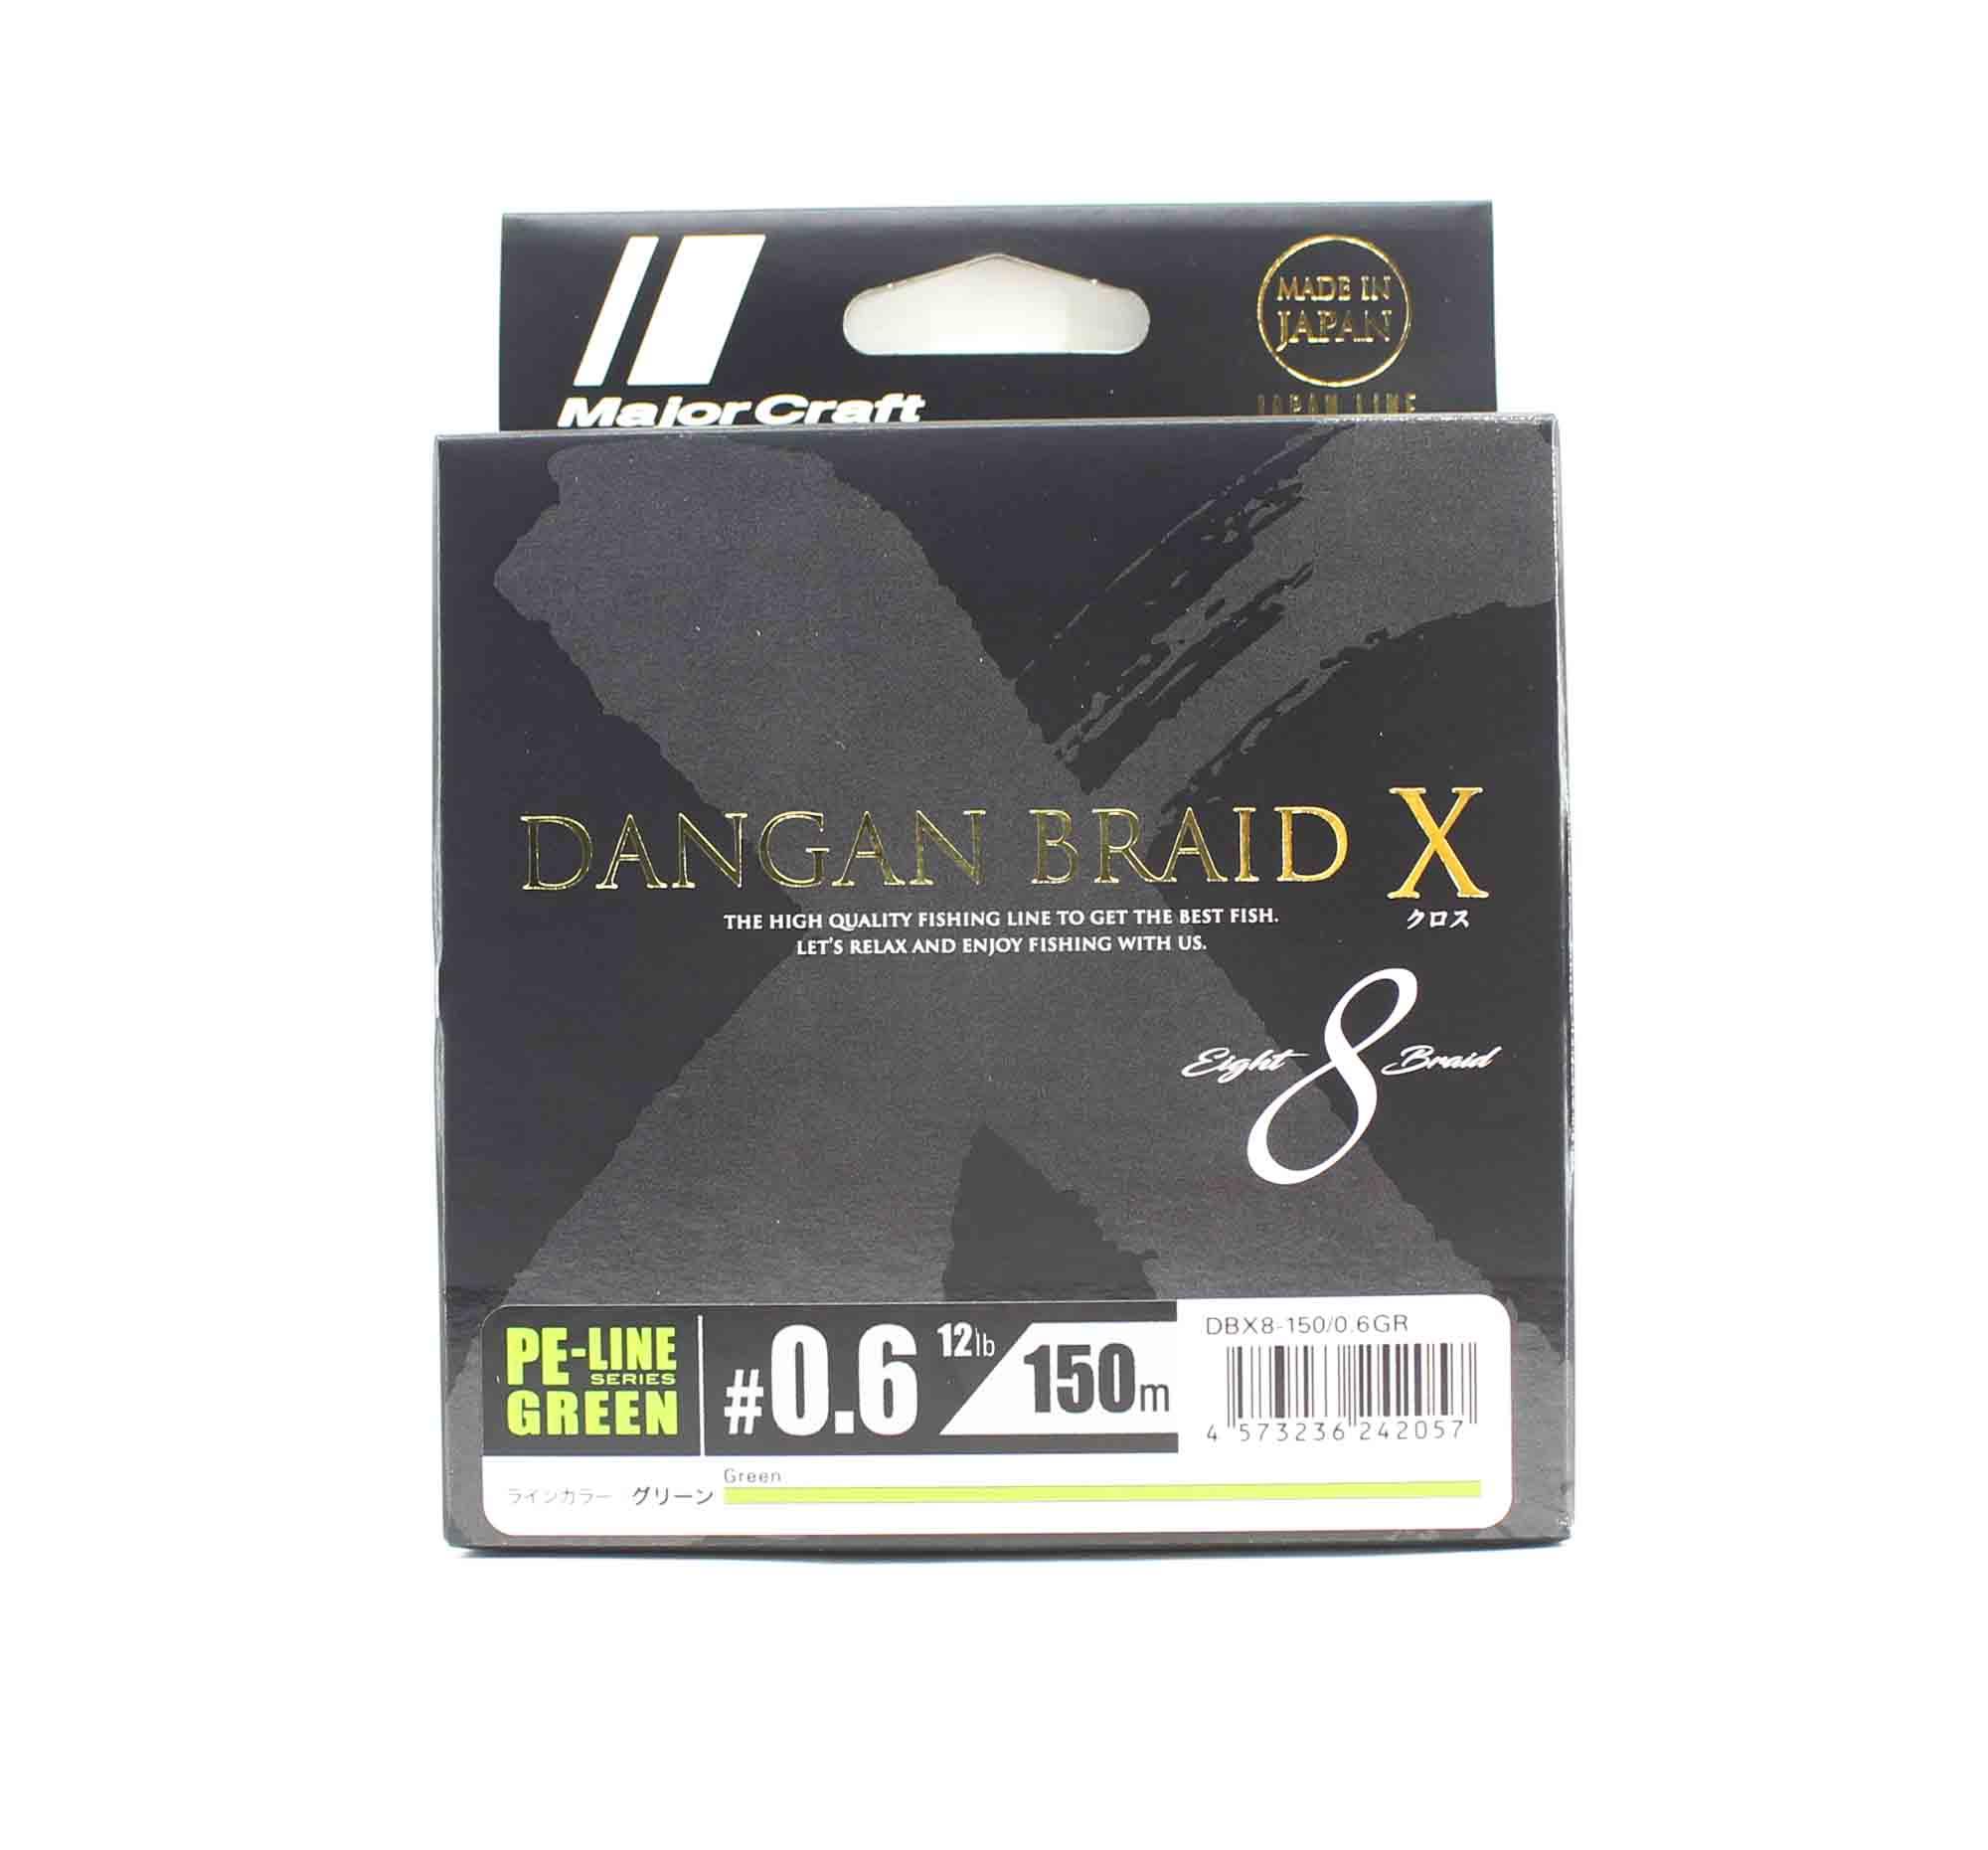 Major Craft Dangan Braid X Line X8 150m P.E 0.6 Green DBX8-150/0.6GR (2057)